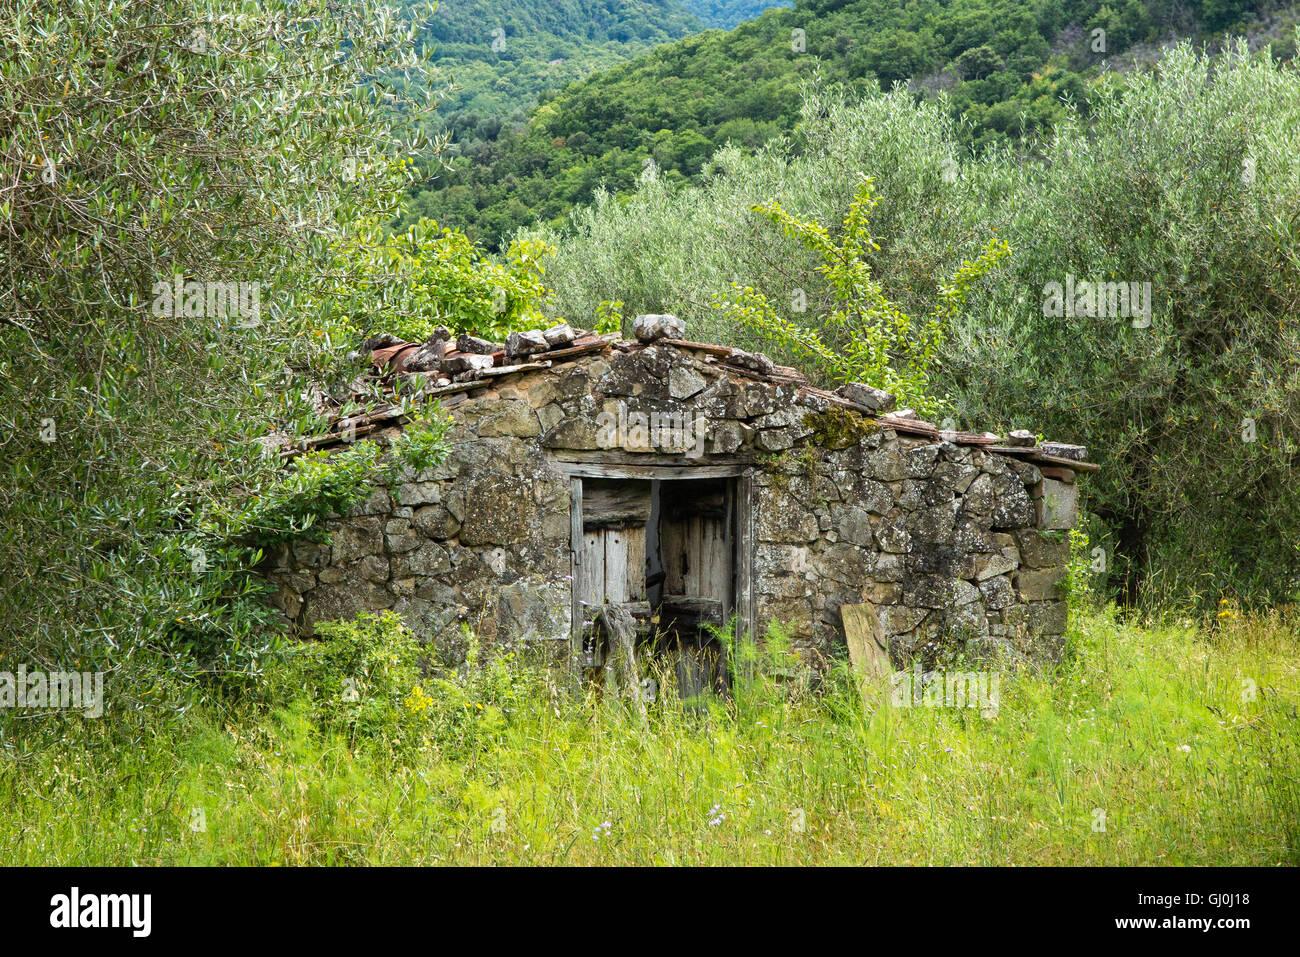 a derelict hut nr Castel del Piano, Grosseto, Tuscany, Italy - Stock Image